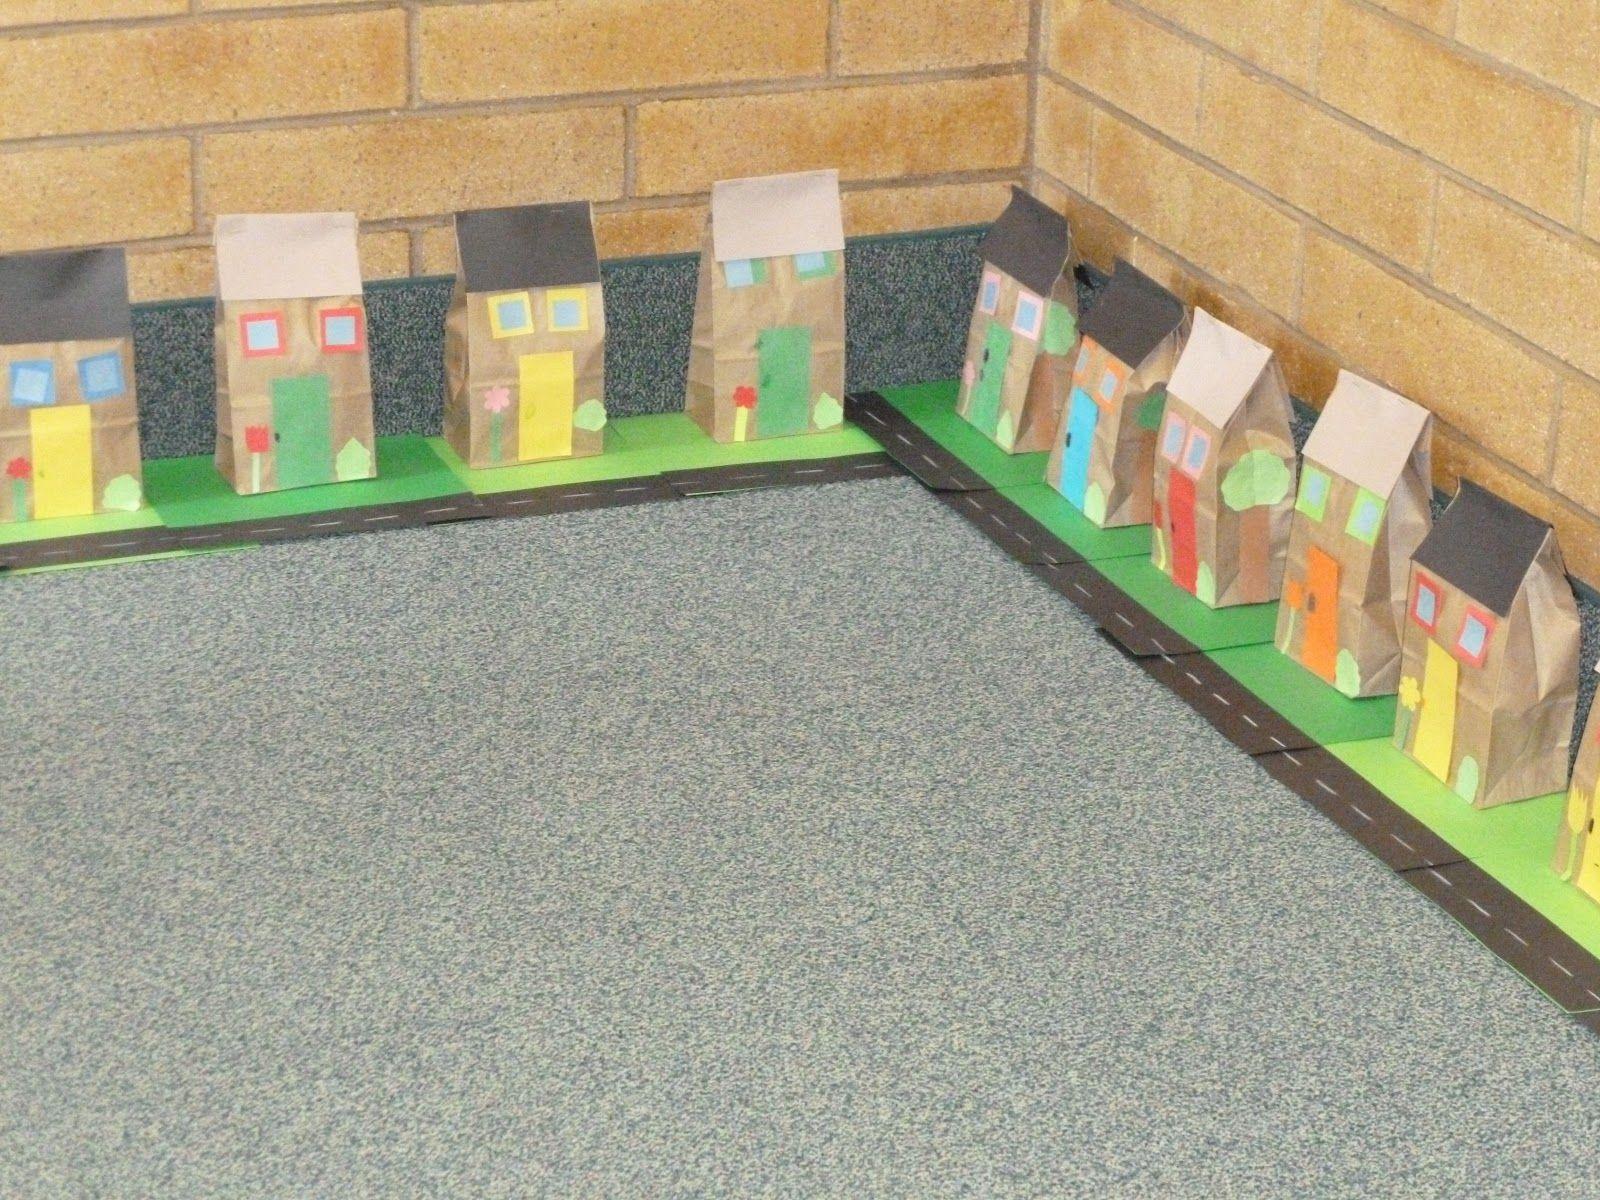 Neighborhood project creative ideas for kids kindergarten social